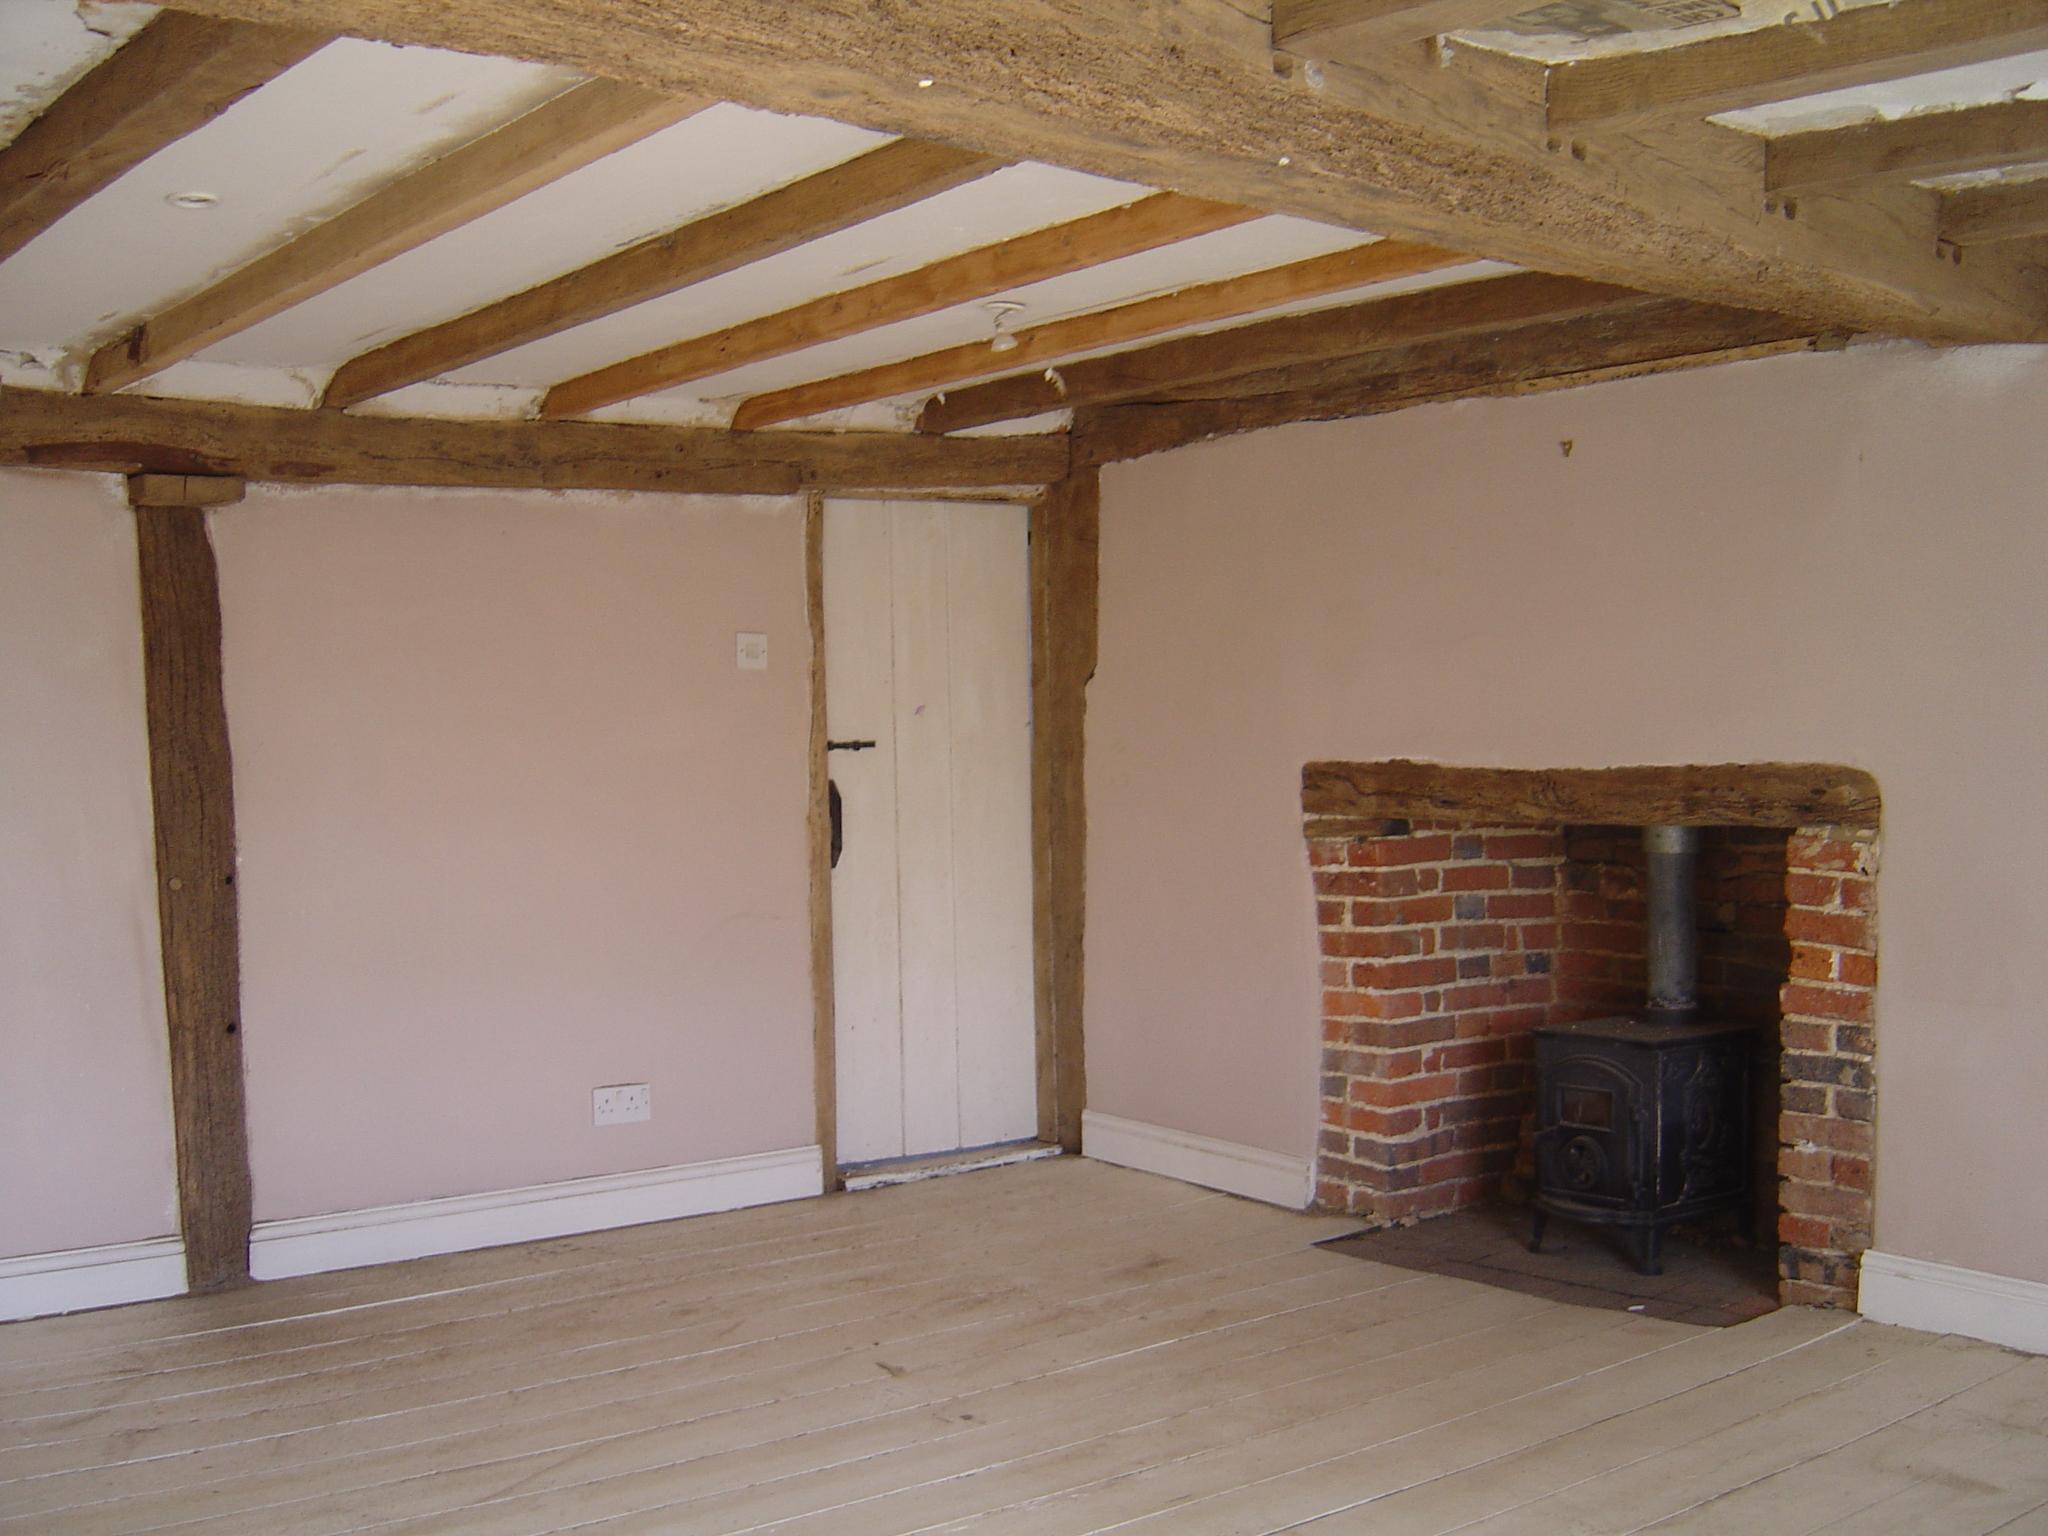 Beams Fireplace 1 - Wood